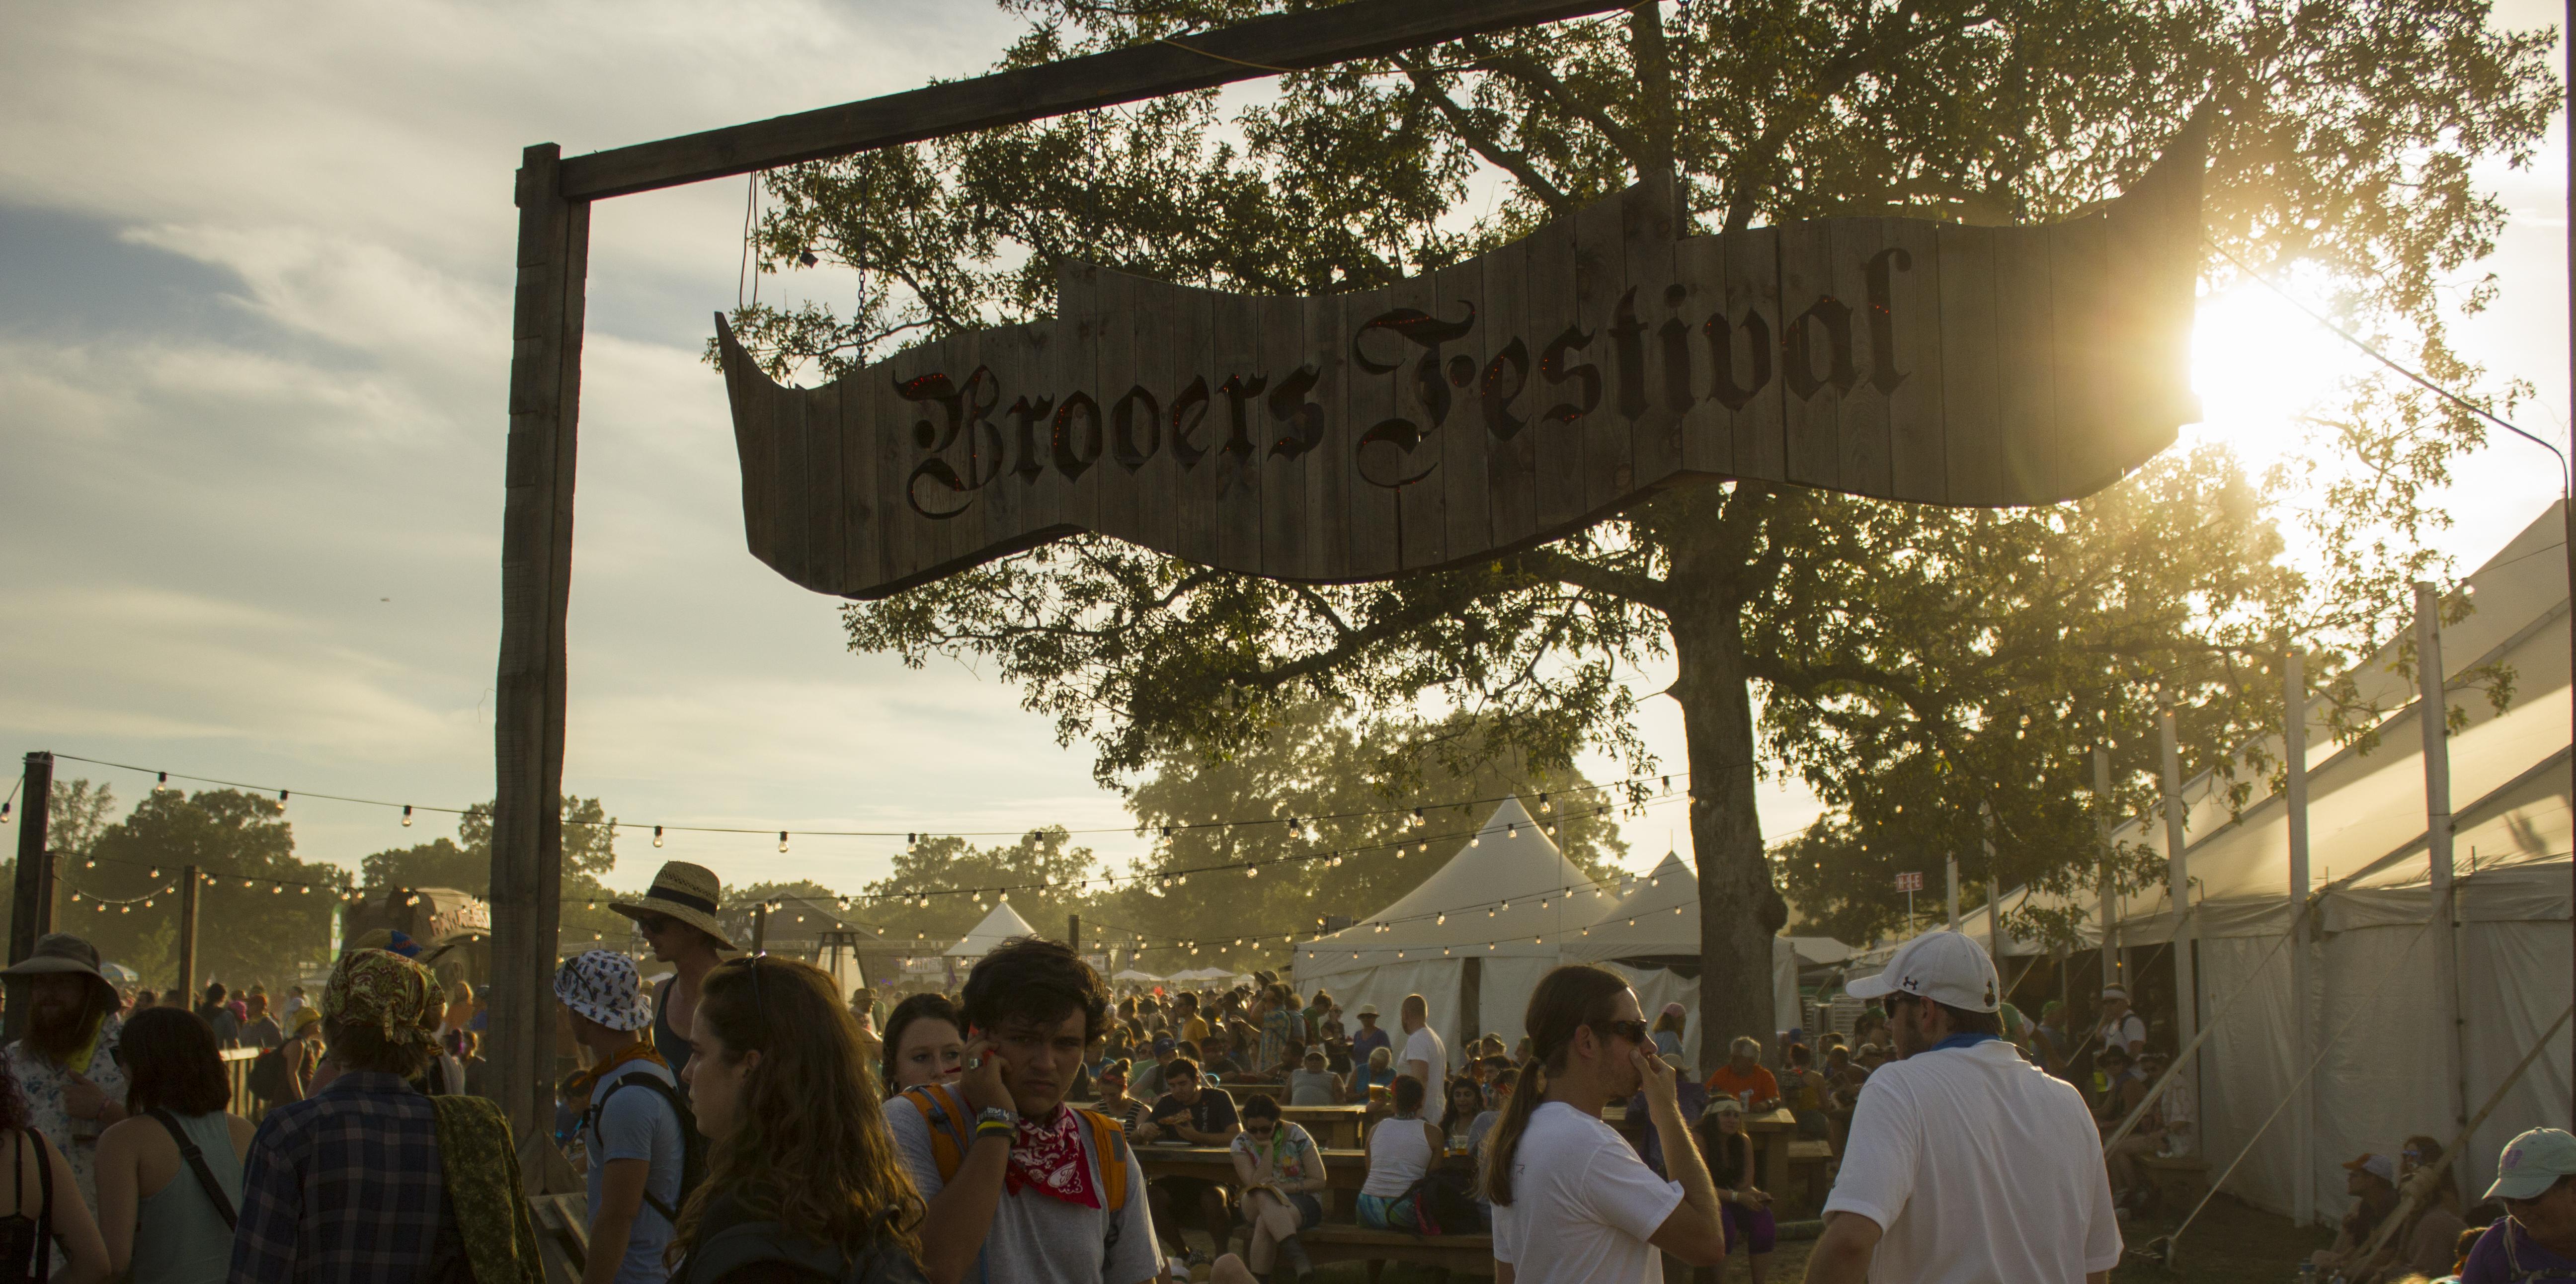 Beer tent at Bonnaroo 2015. Photo by: Matthew McGuire